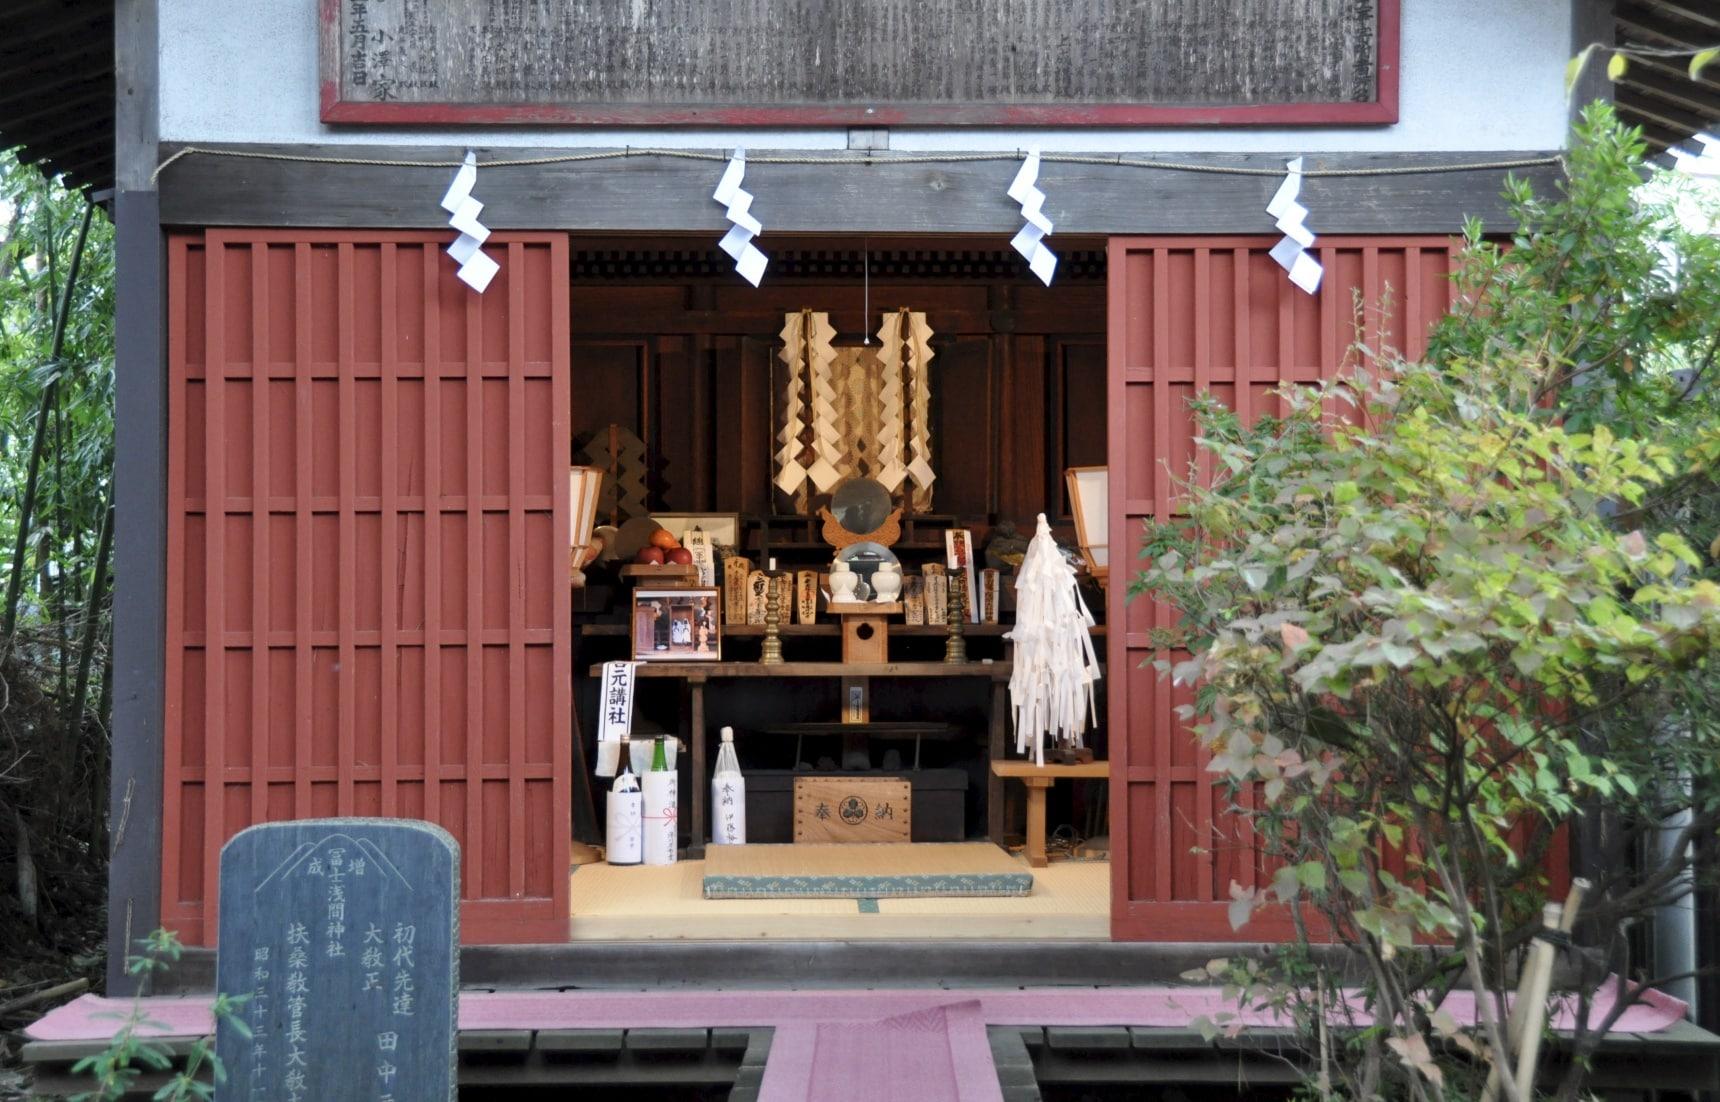 Zuzuya: Ink Talismans at a Fuji Pilgrim's Inn